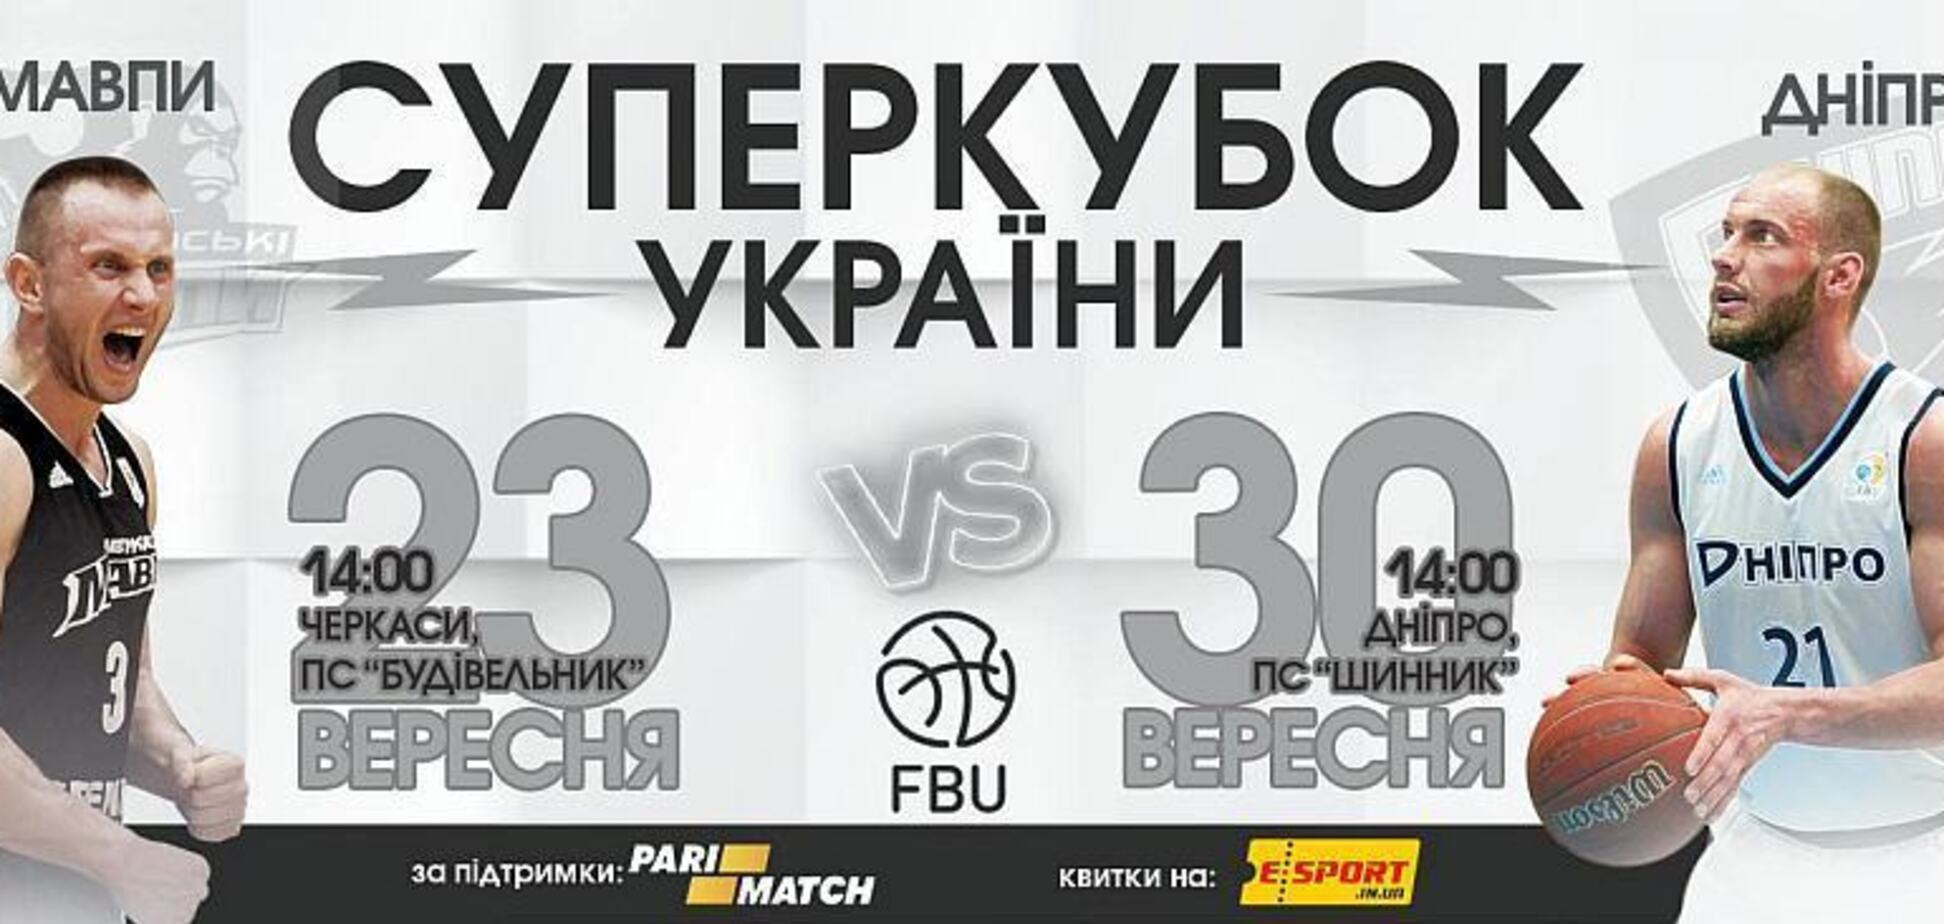 Суперкубок Украины по баскетболу покажут ObozTV и XSPORT